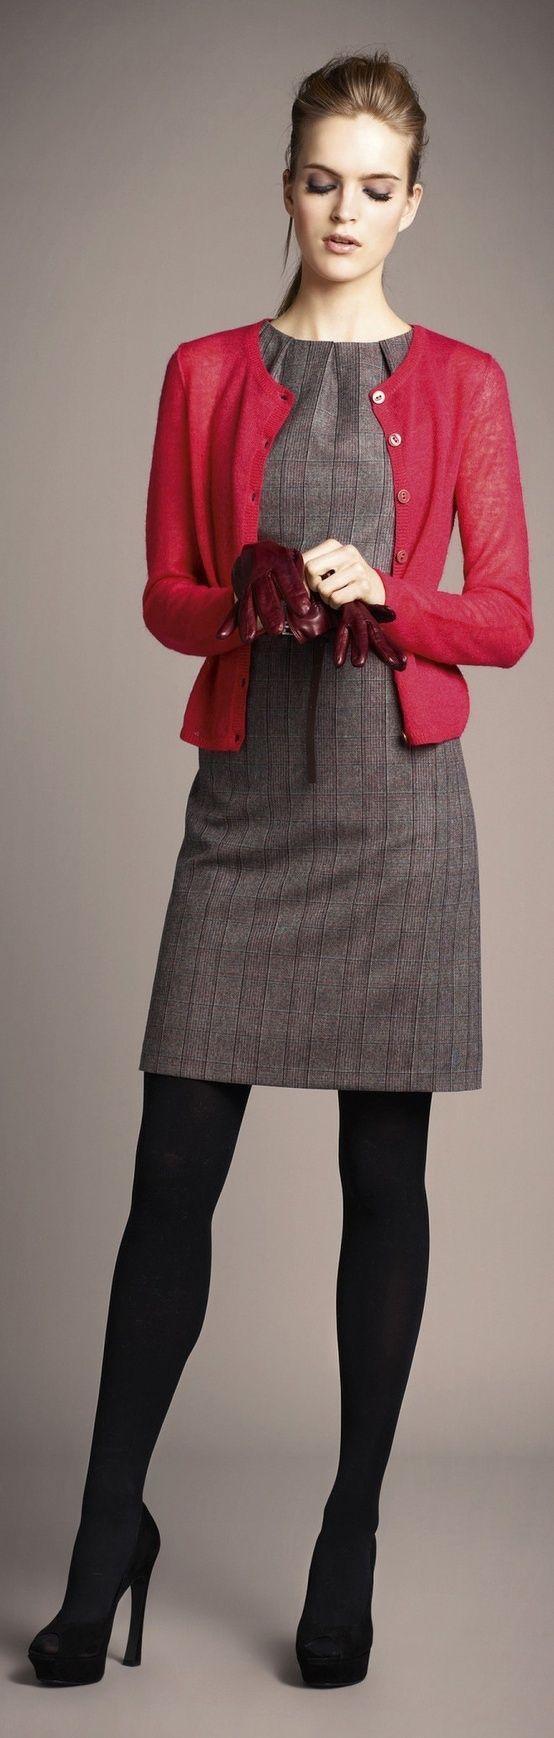 Look ejecutivo: grey + red